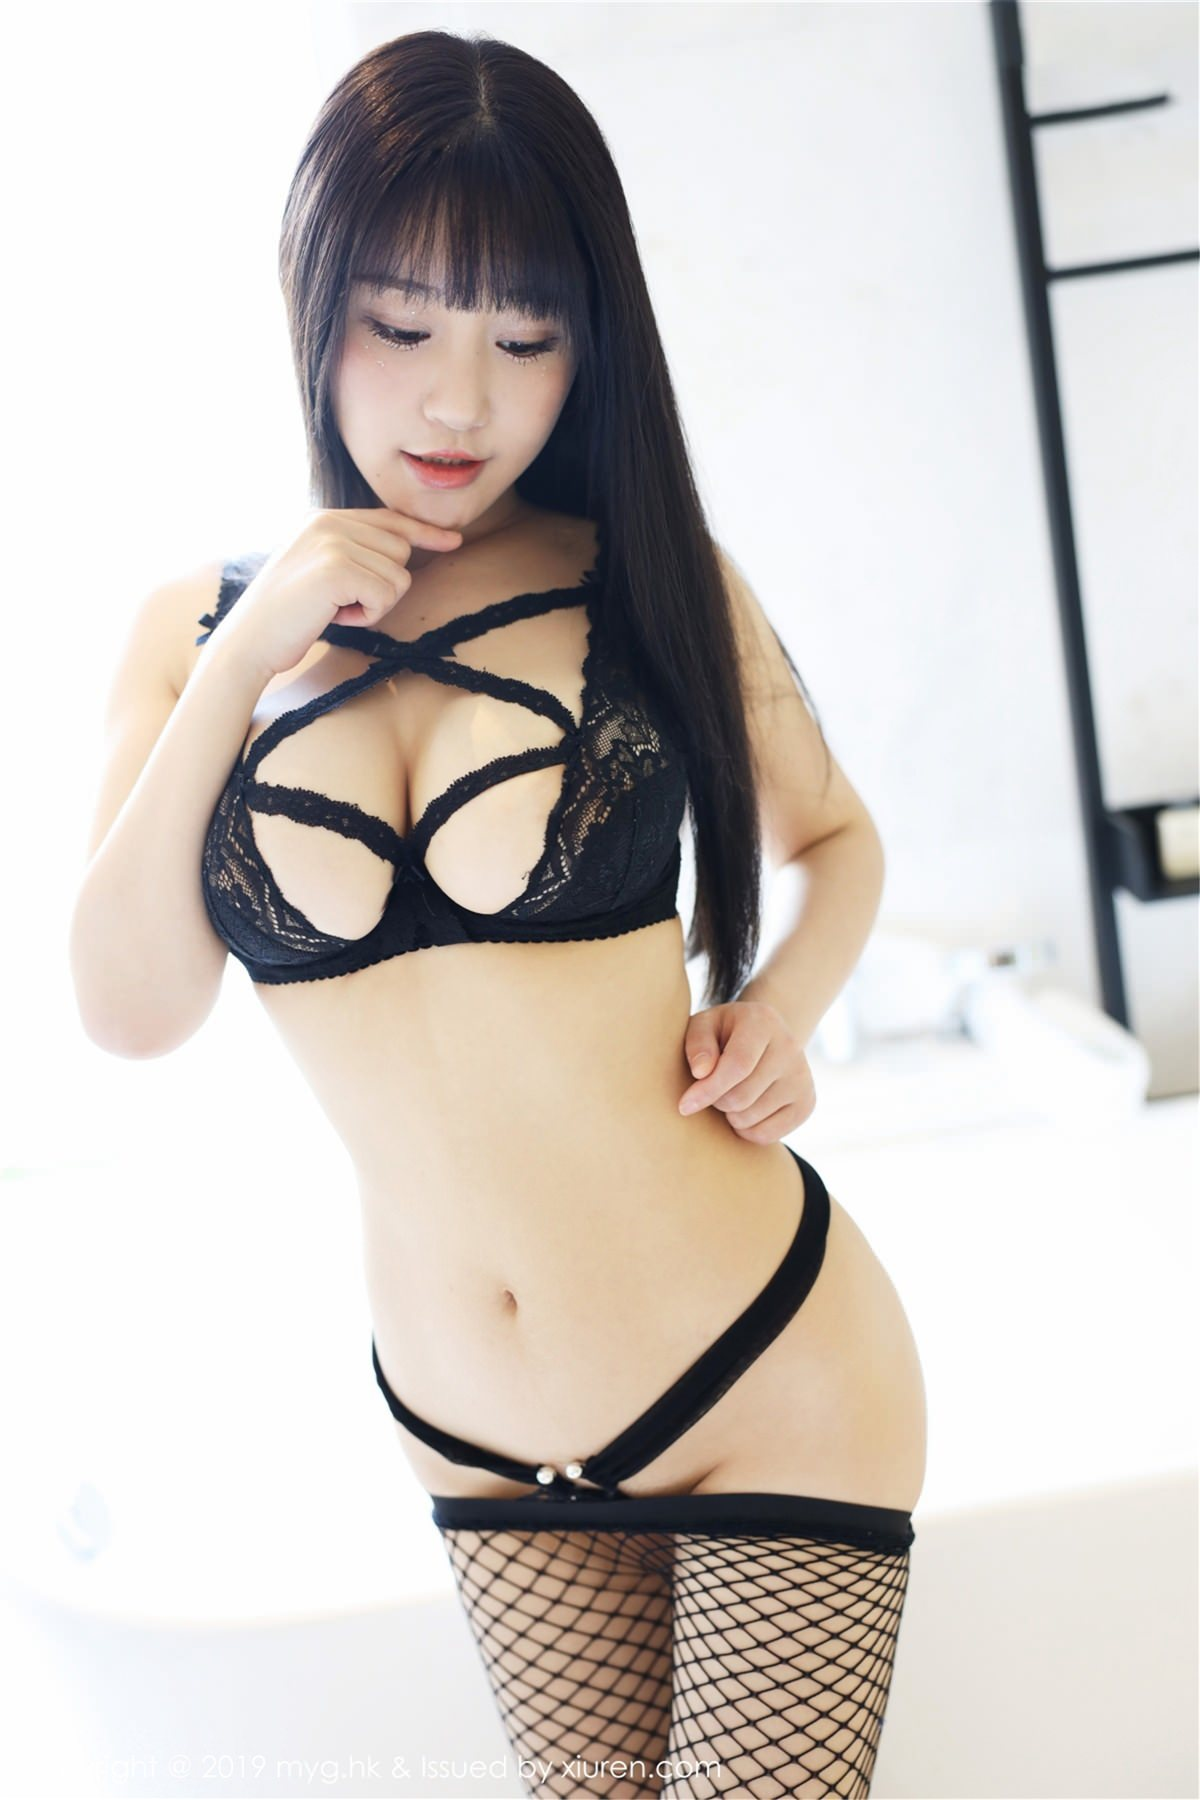 MyGirl Vol.357 96P, mygirl, Zhu Ke Er